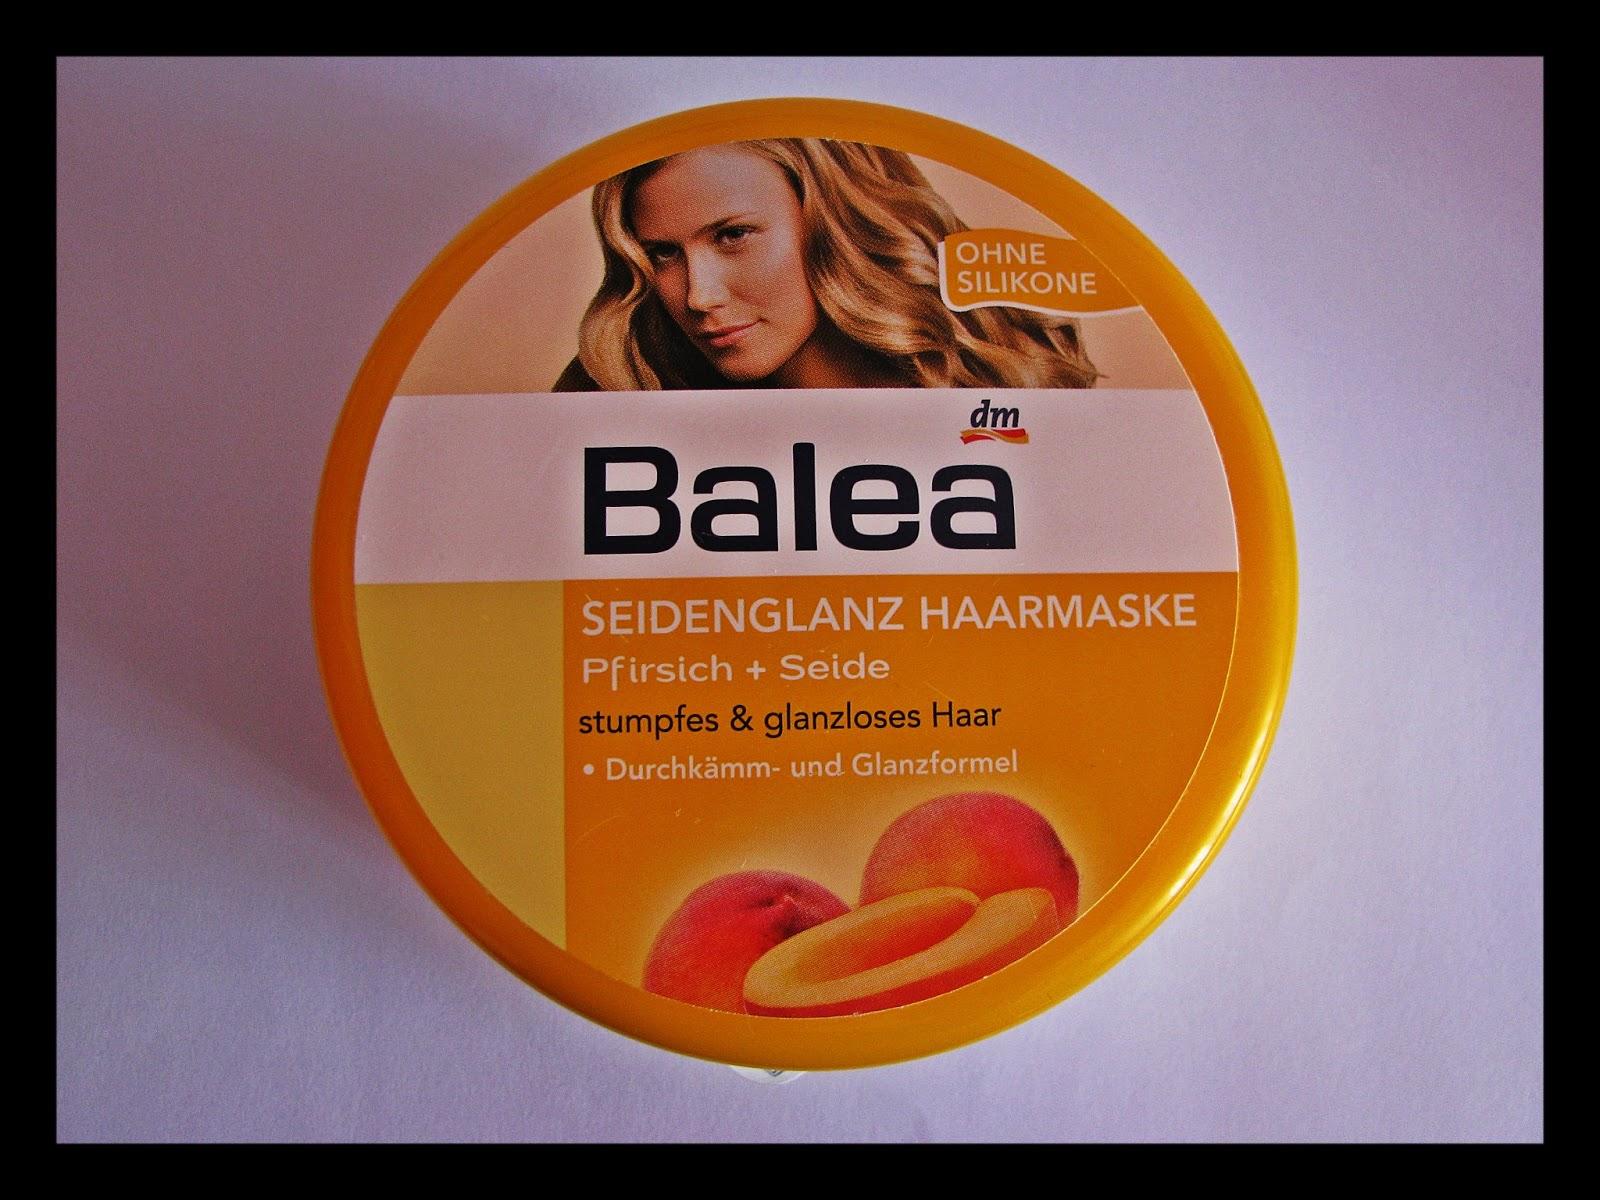 Balea Hair Mask Among Beauty Drawers